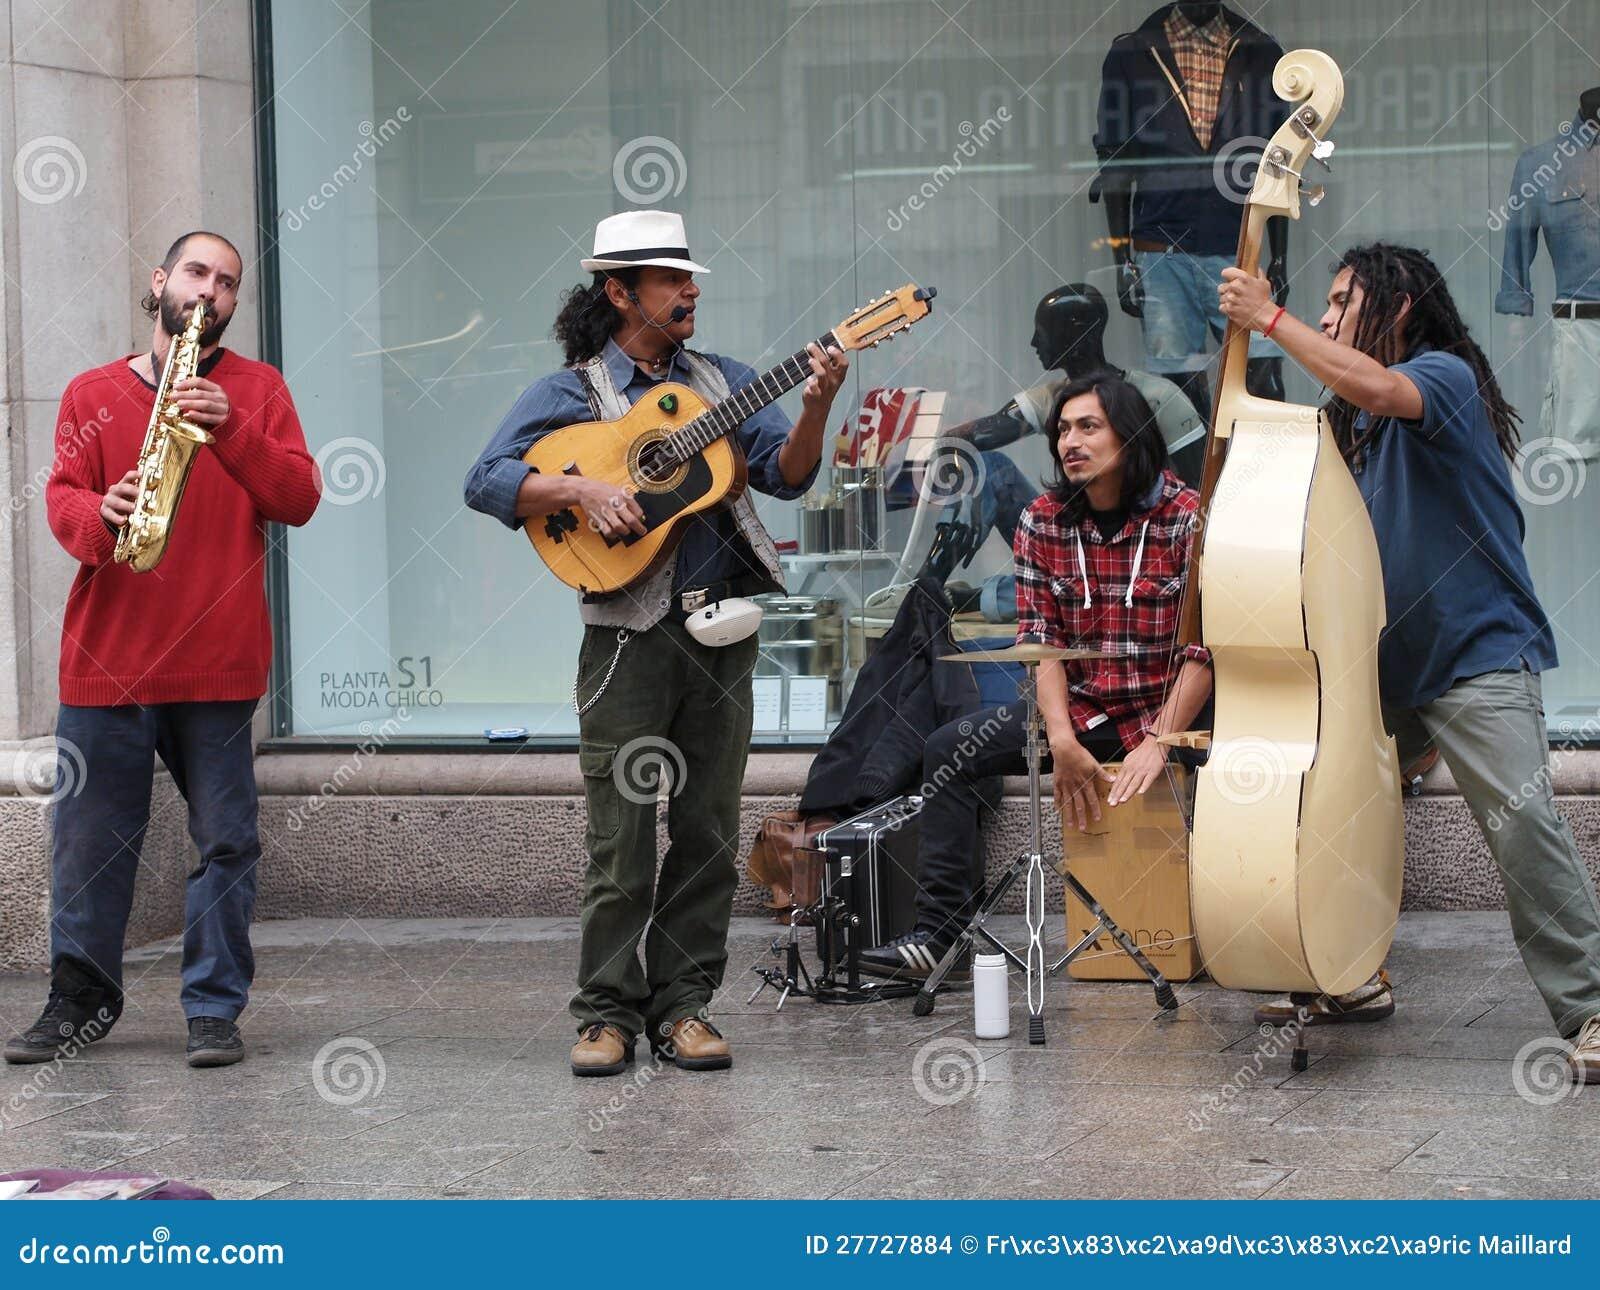 Barcelona April 2012, Straßenmusiker